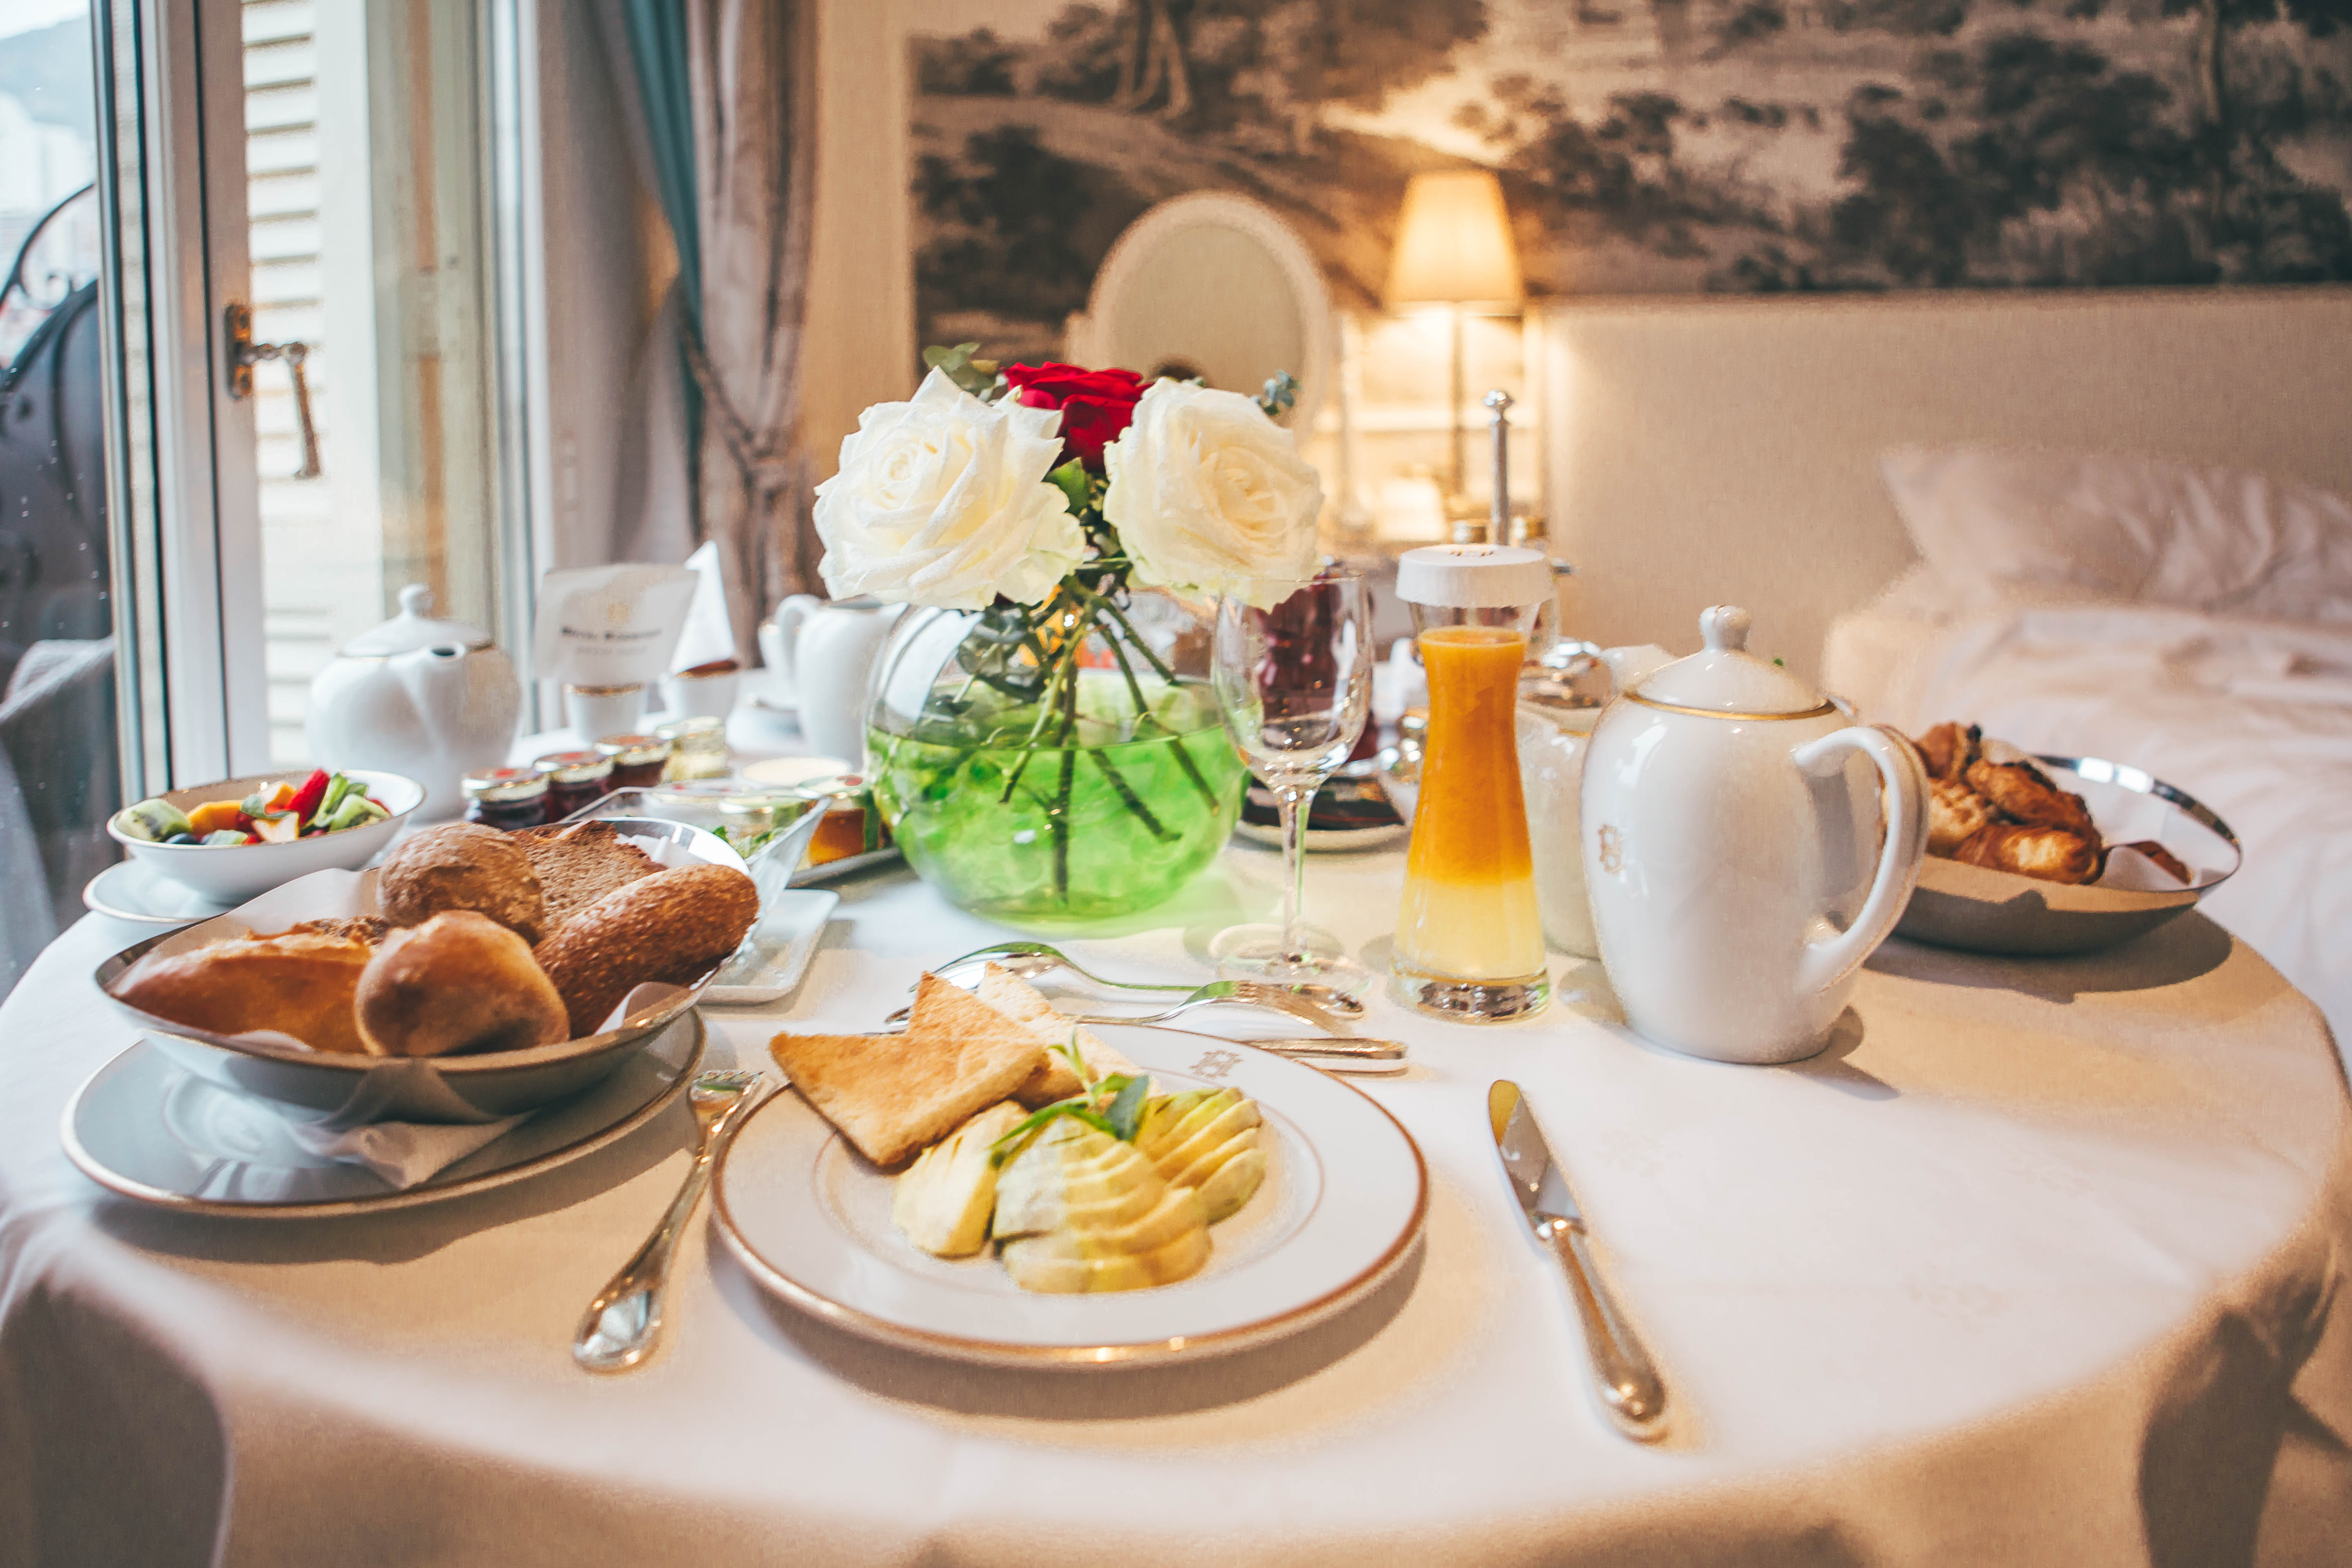 Hotel Hermitage room service